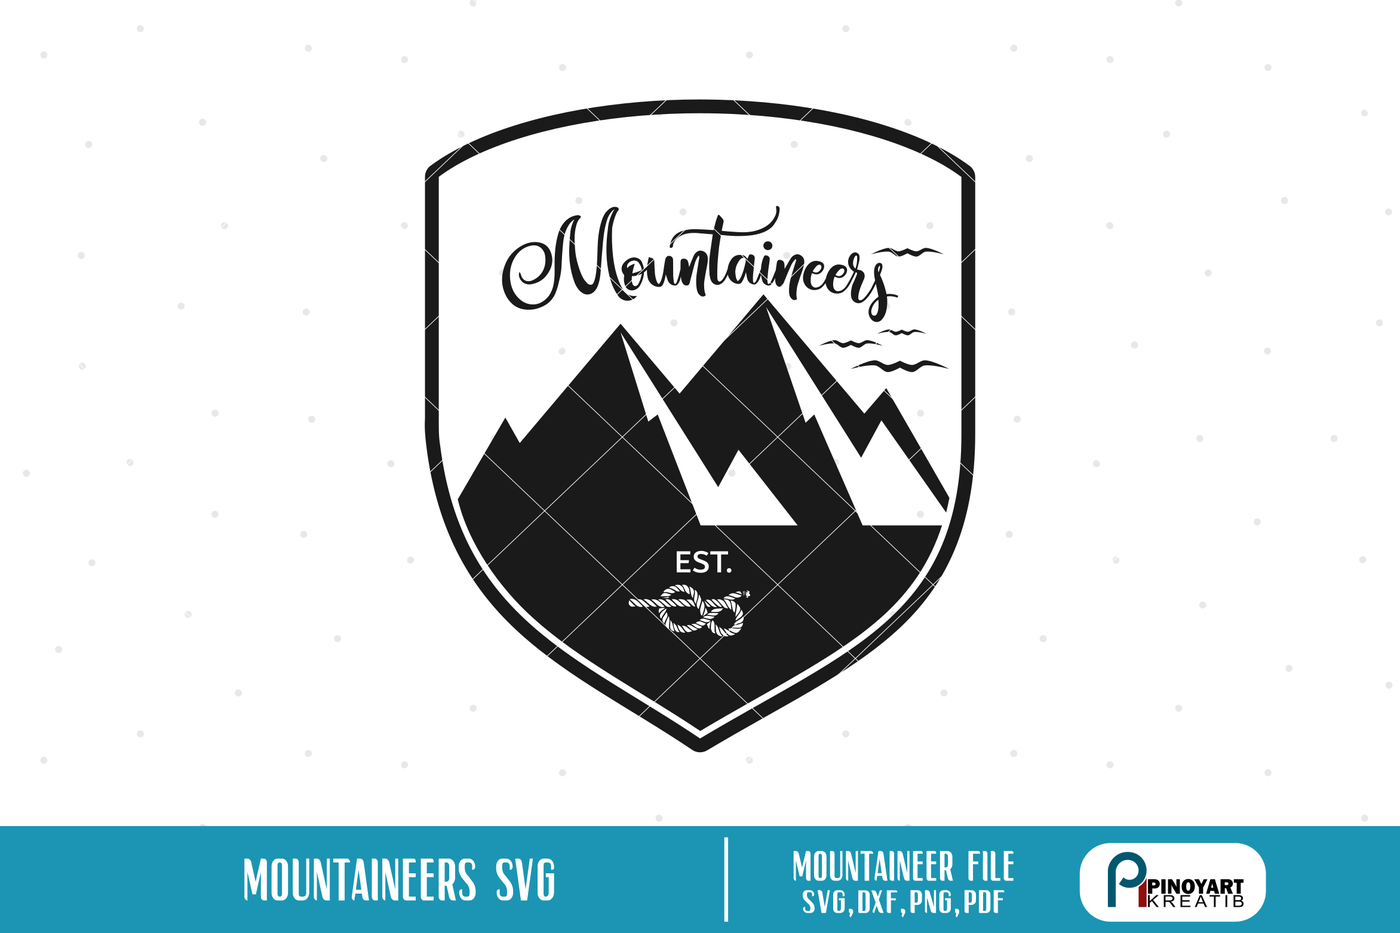 Mountaineers Svg Mountaineers Logo Svg Mountain Svg Mountain Logo